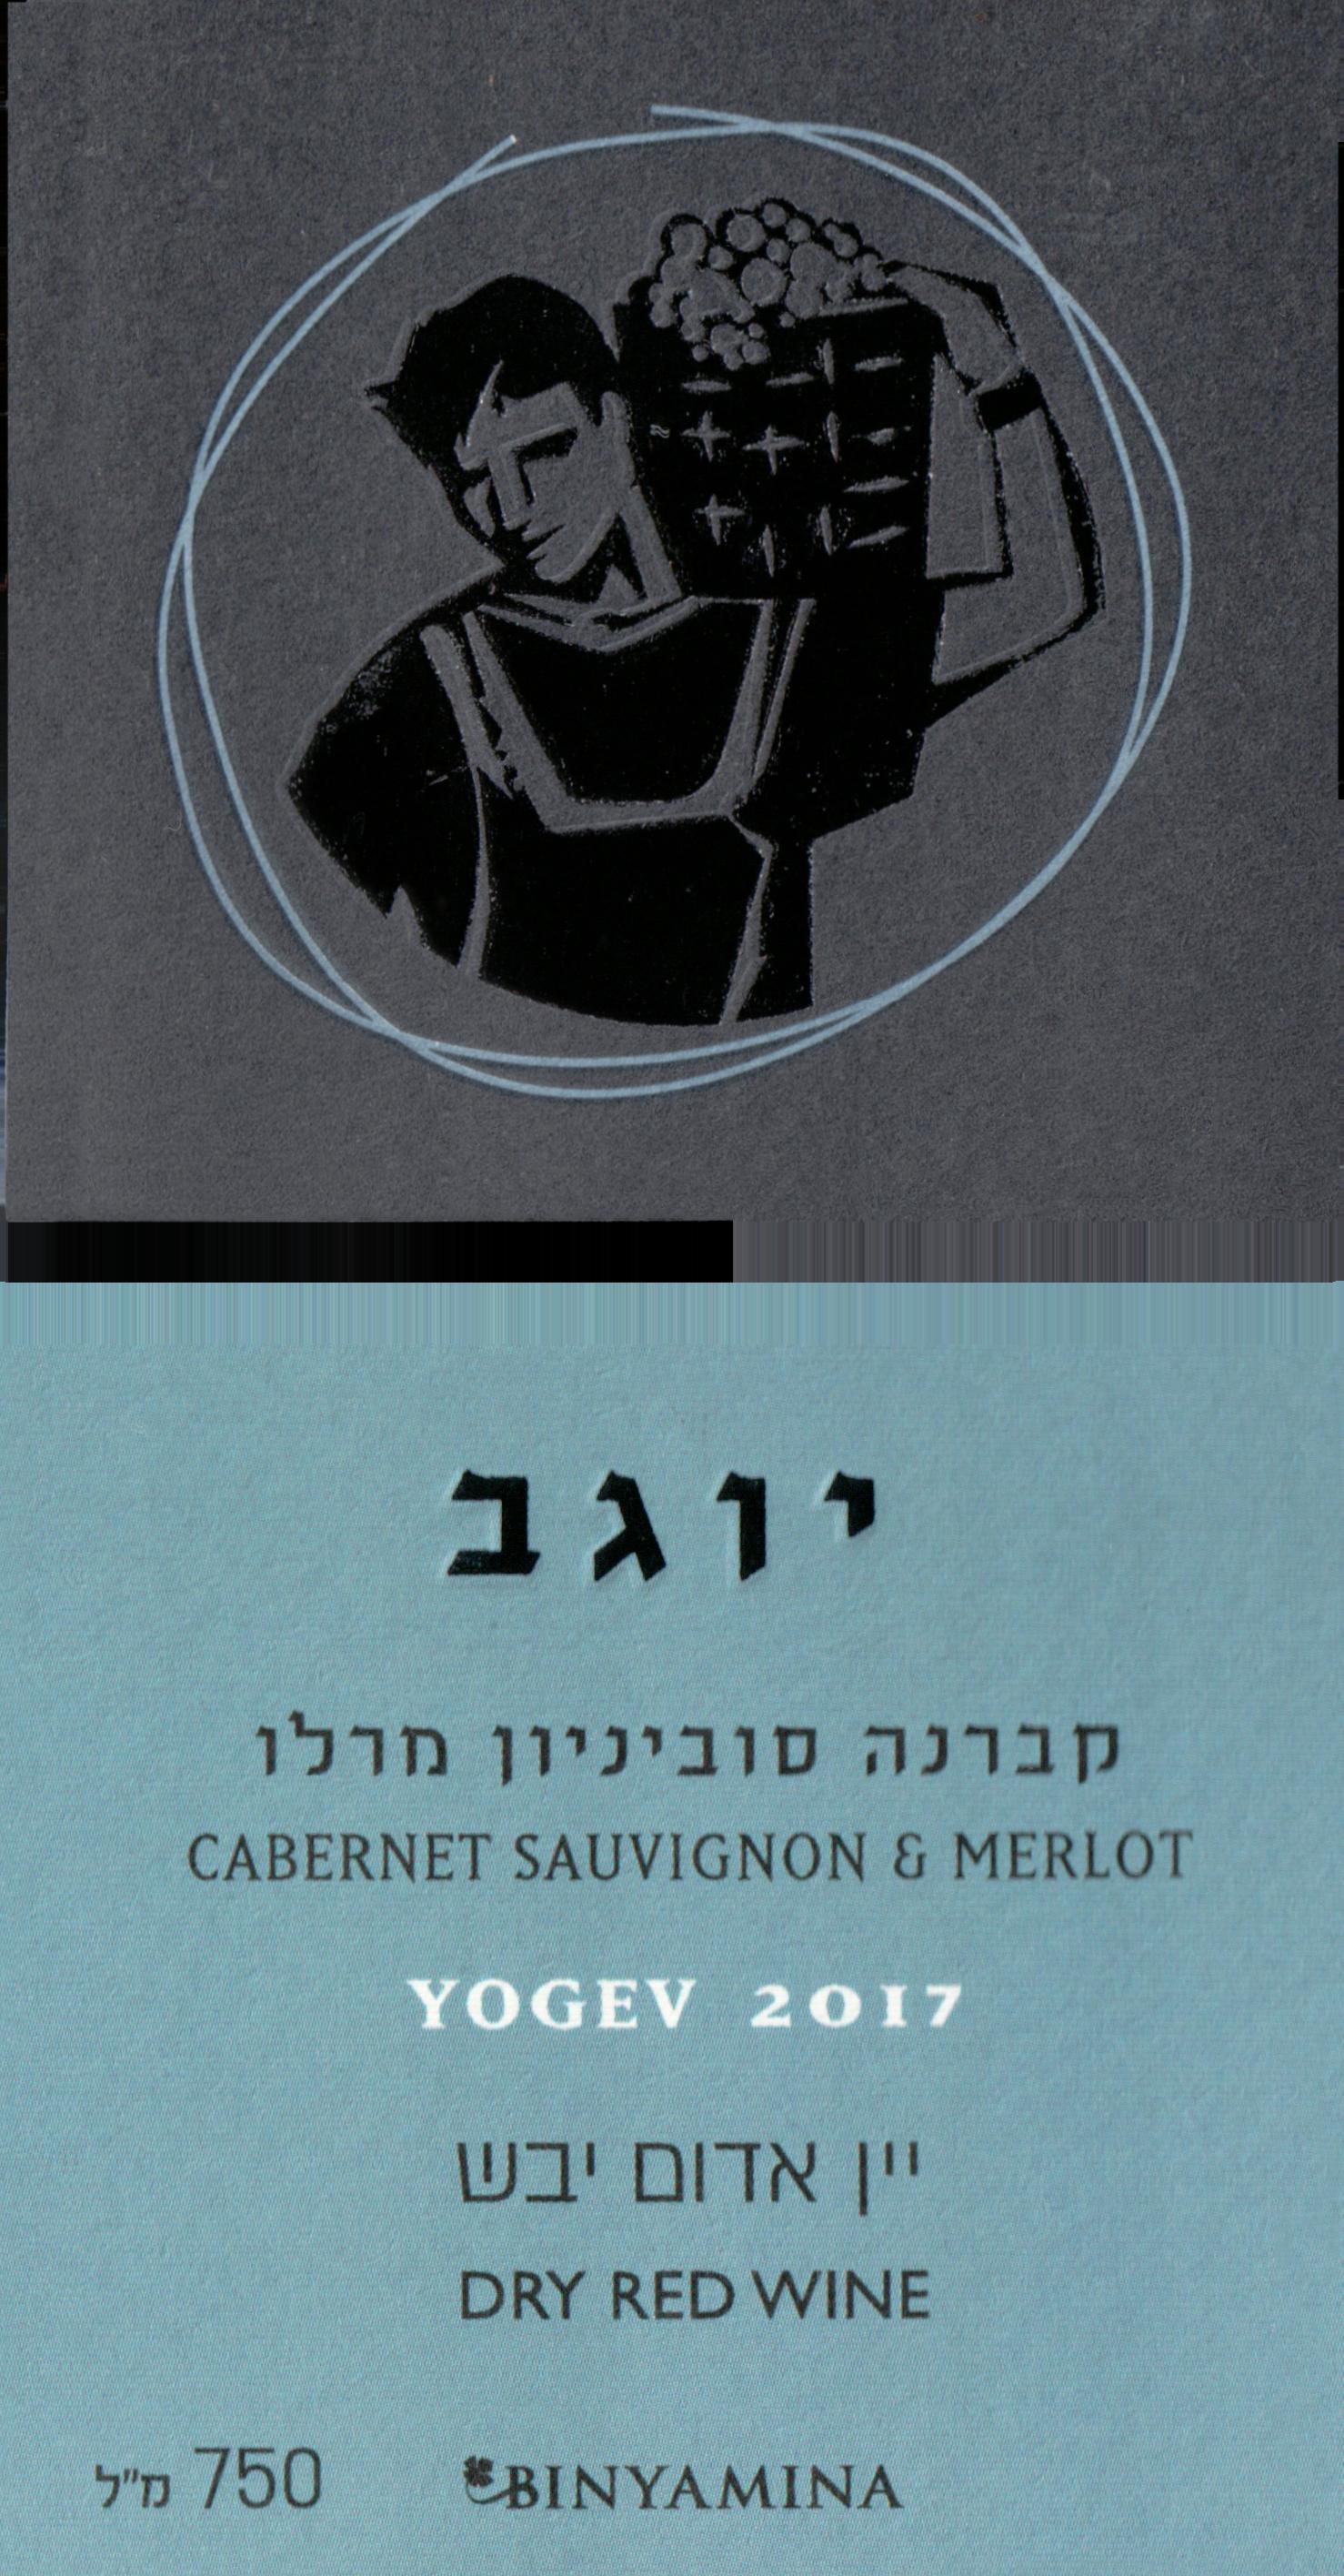 Binyamina Yogev Cabernet Sauvignon/Merlot Upper Galilee 2017